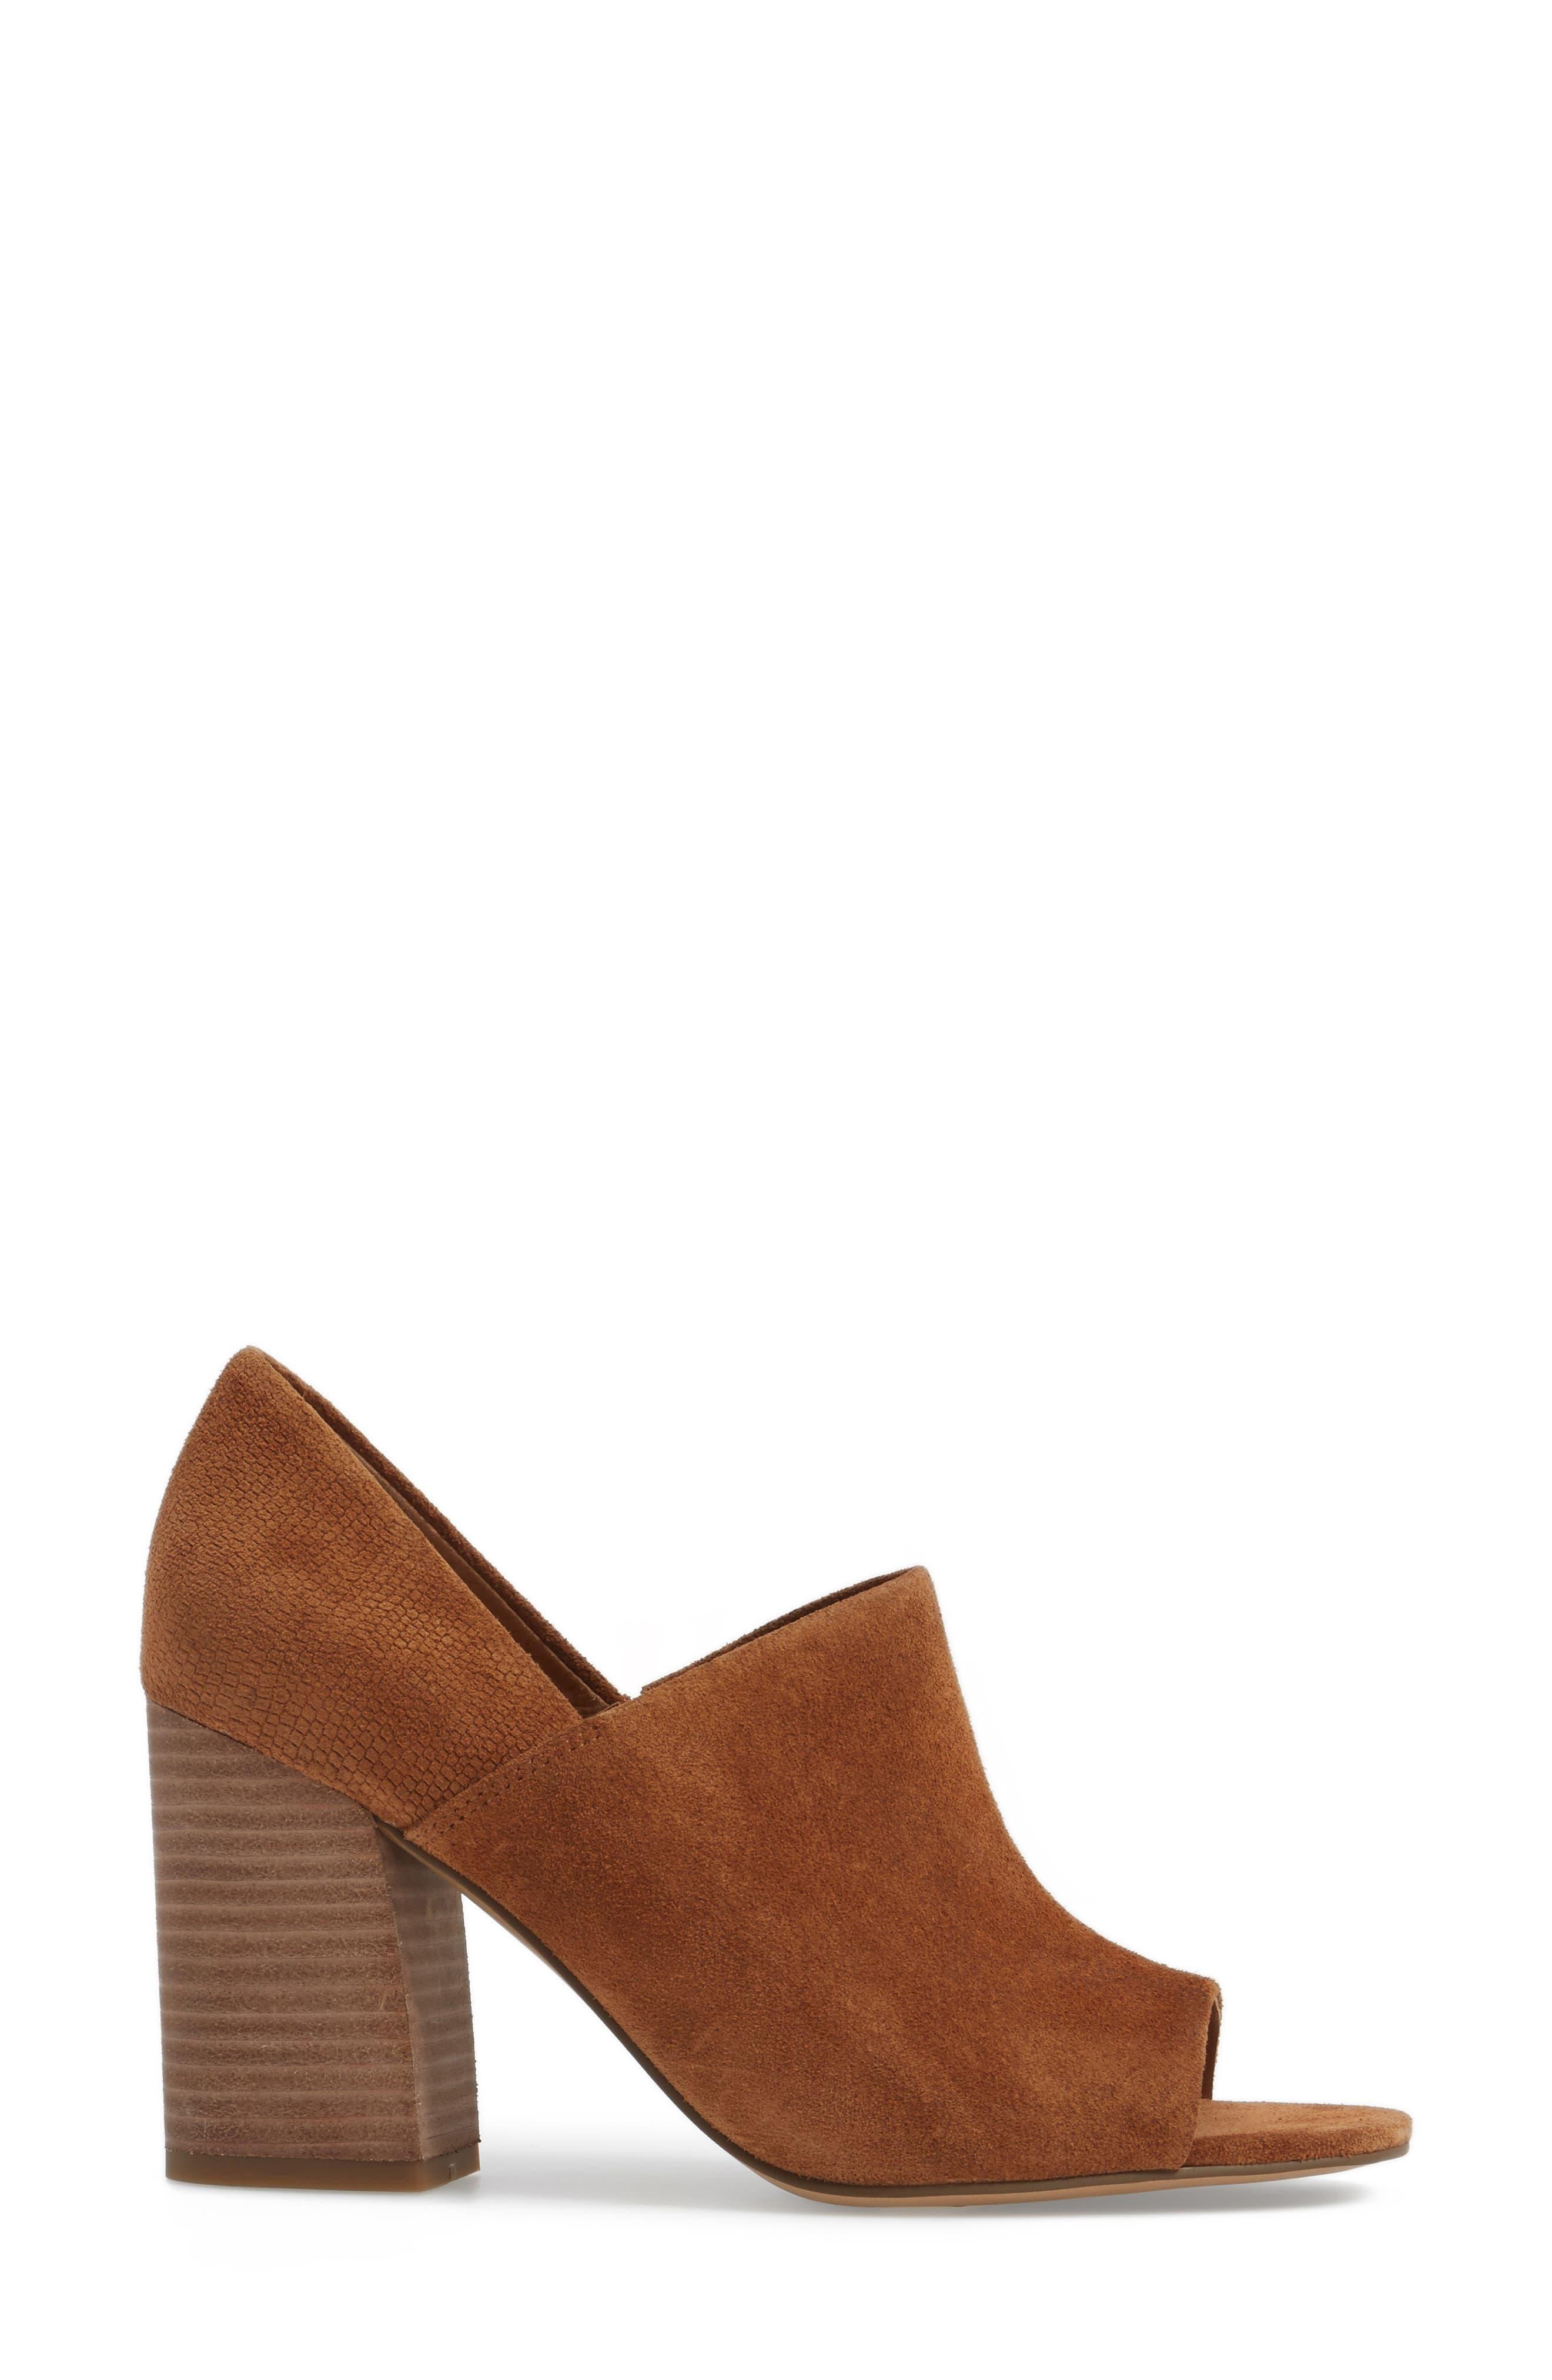 Ellison Block Heel Sandal,                             Alternate thumbnail 8, color,